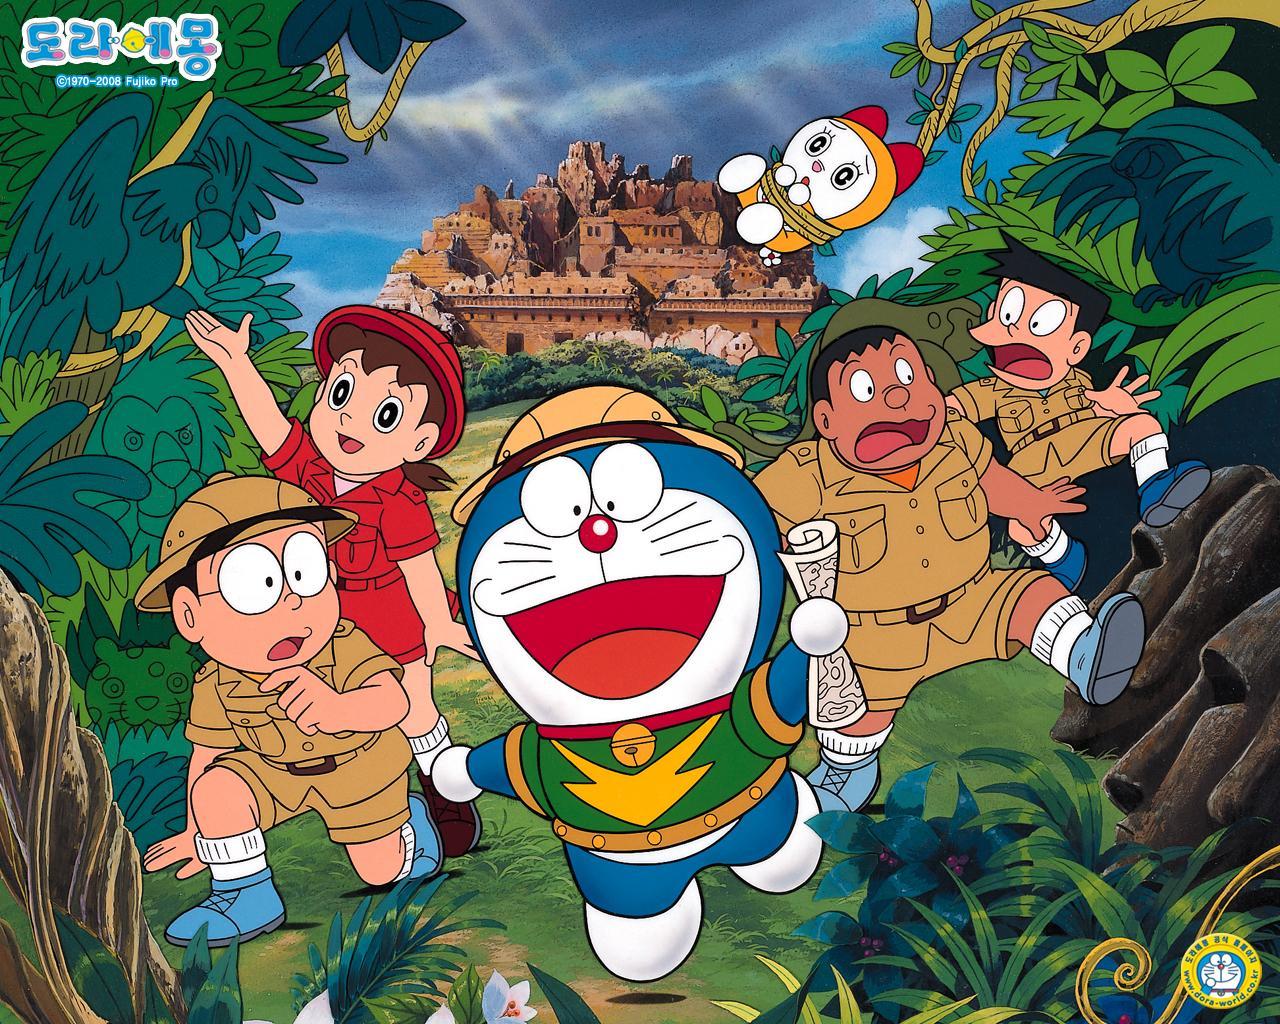 Doraemon-Background-HD-Wallpaper-05